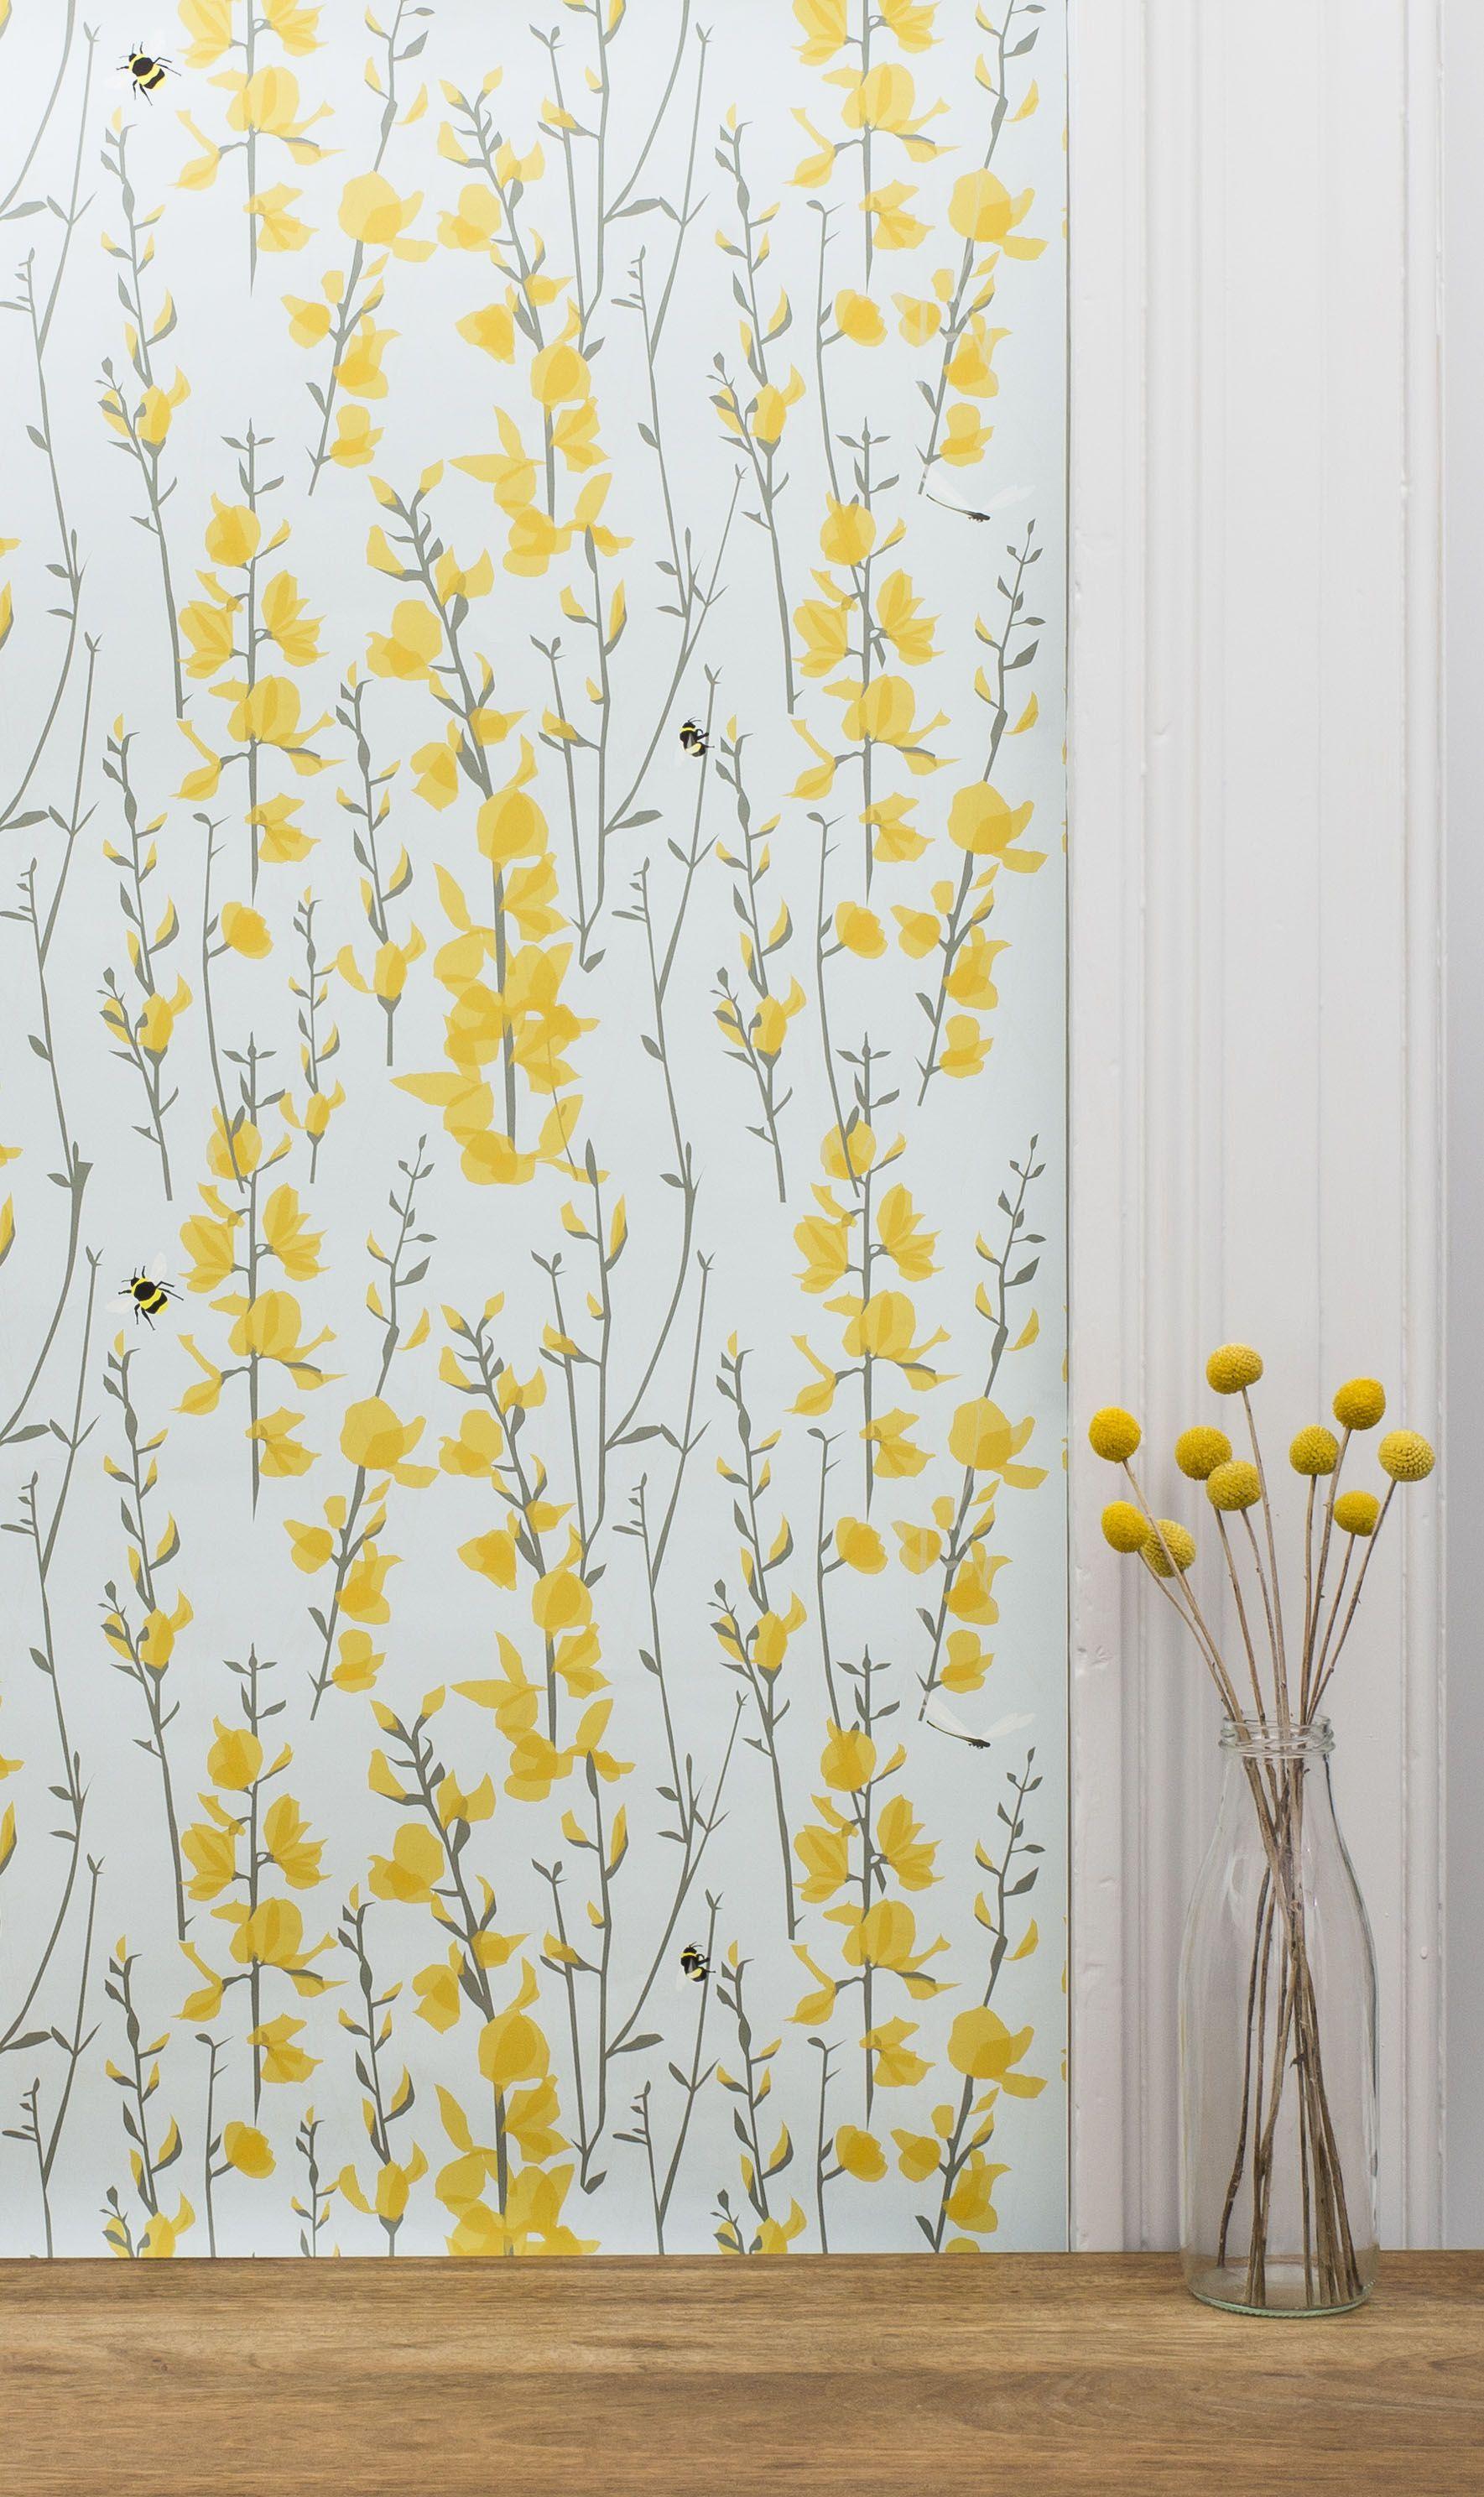 Broom And Bee Sky Wallpaper Sample Contemporary Wallpaper